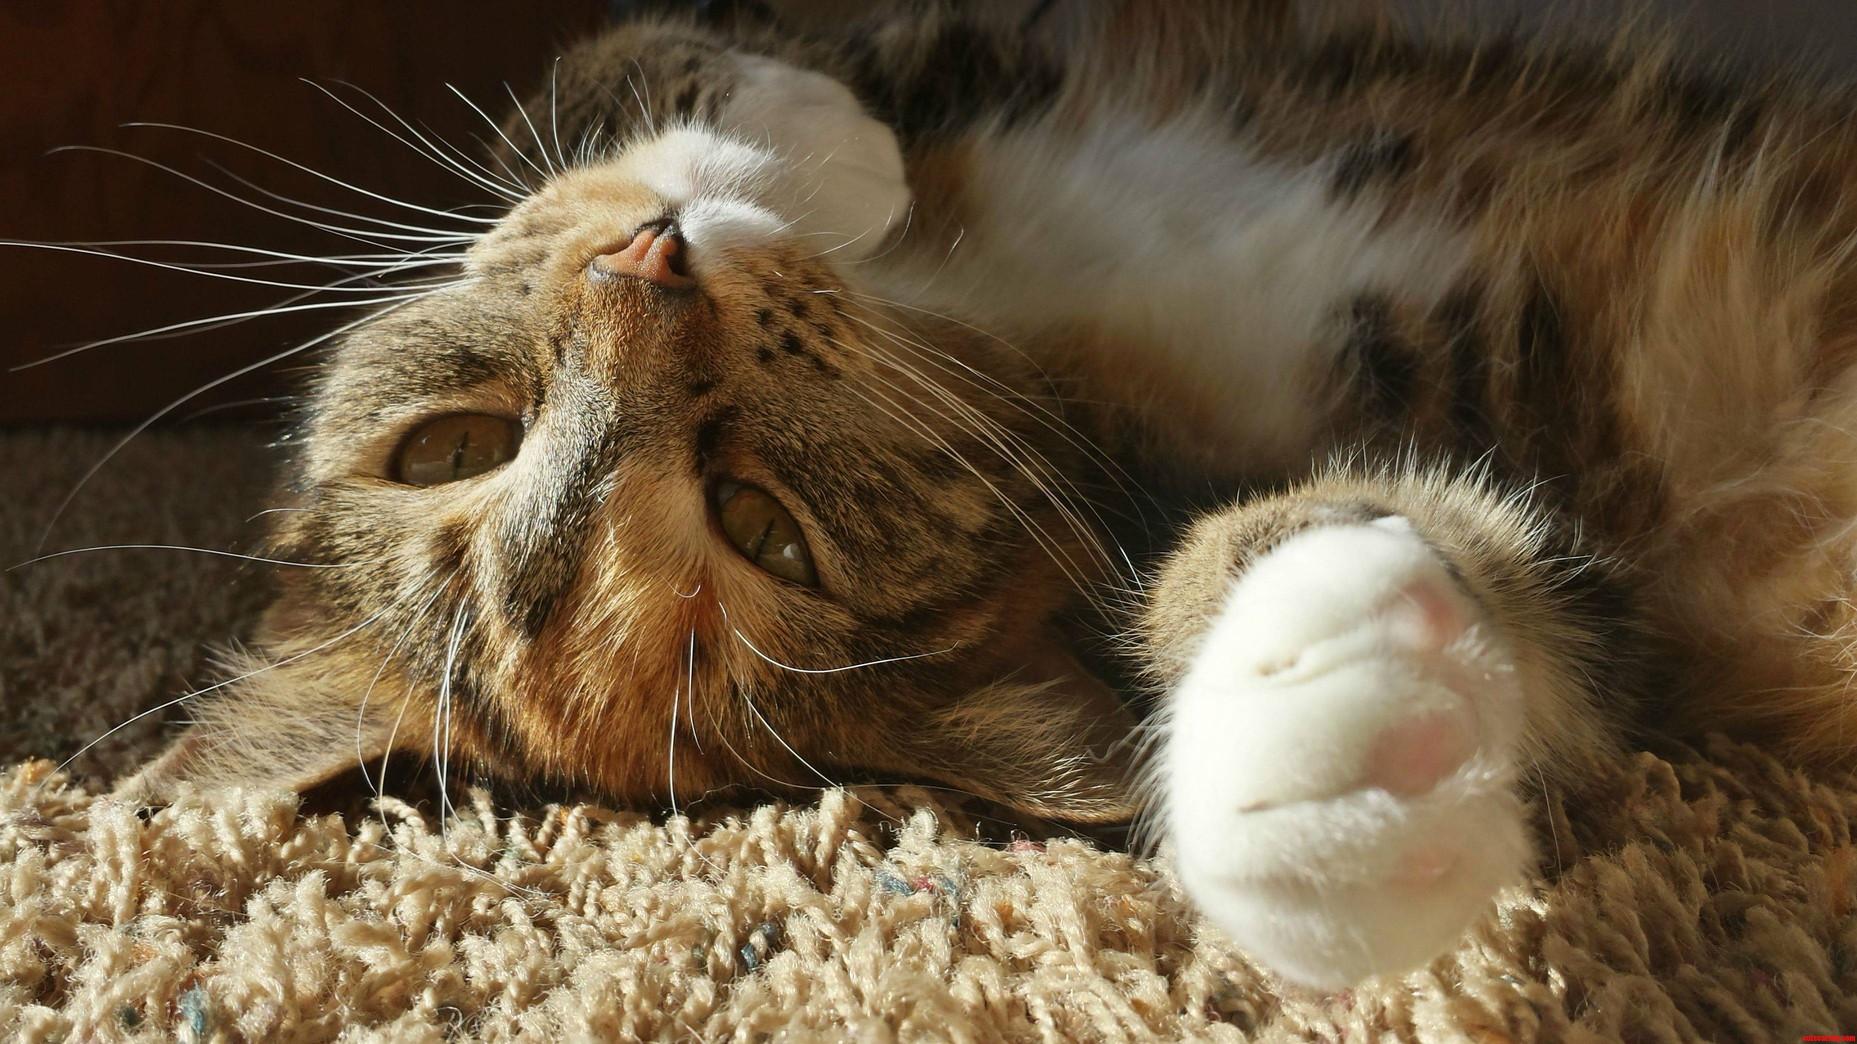 The Sunbather